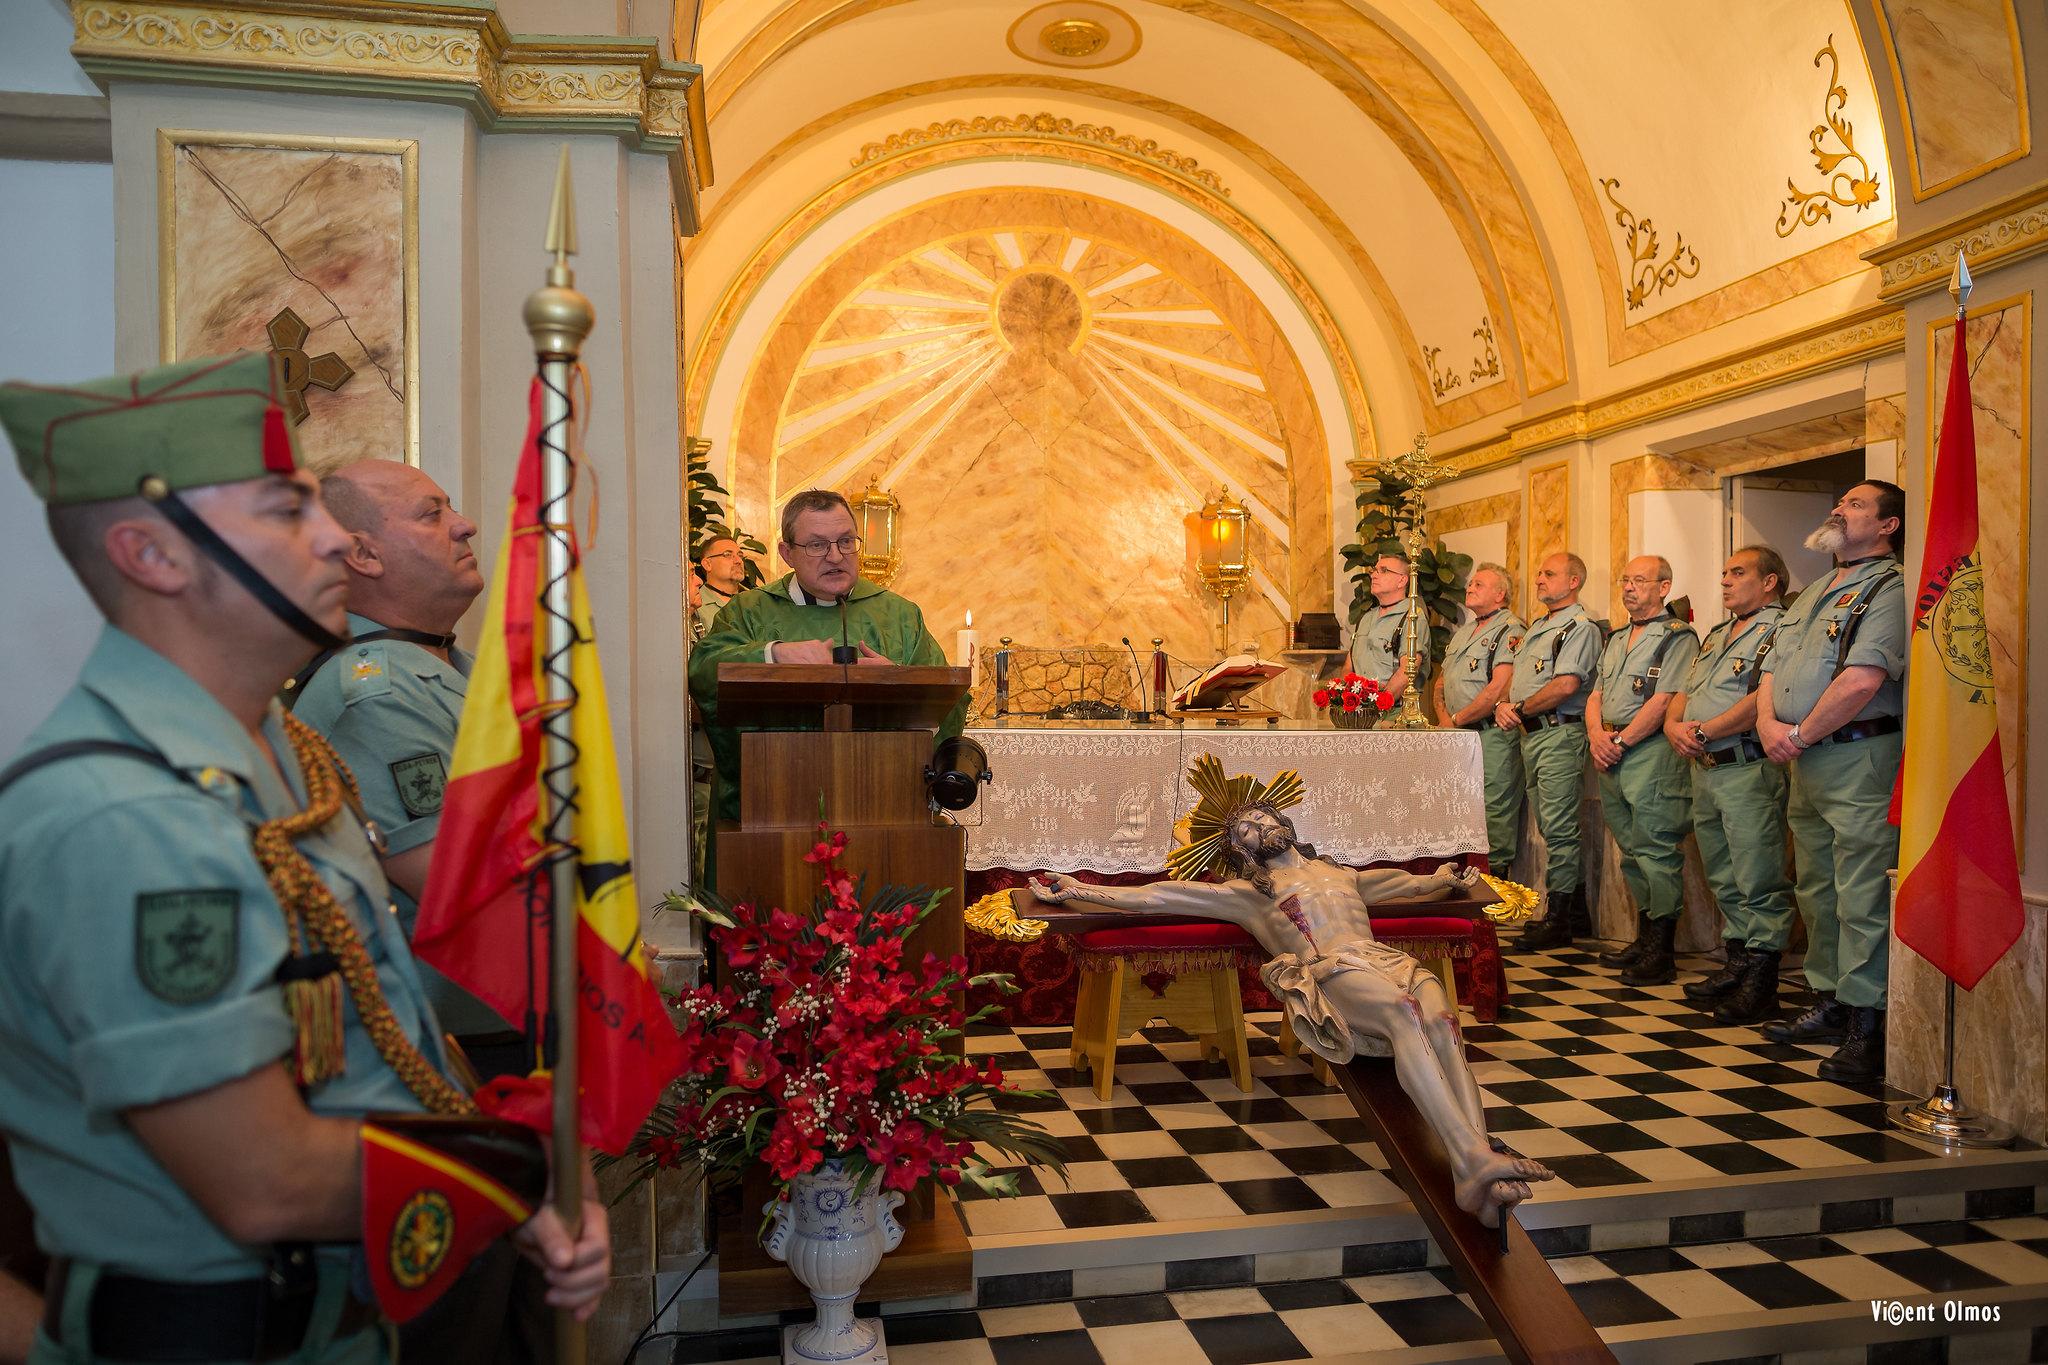 (2017-11-04) - Eucaristía Legionaria -  Vicent Olmos Navarro - (01)